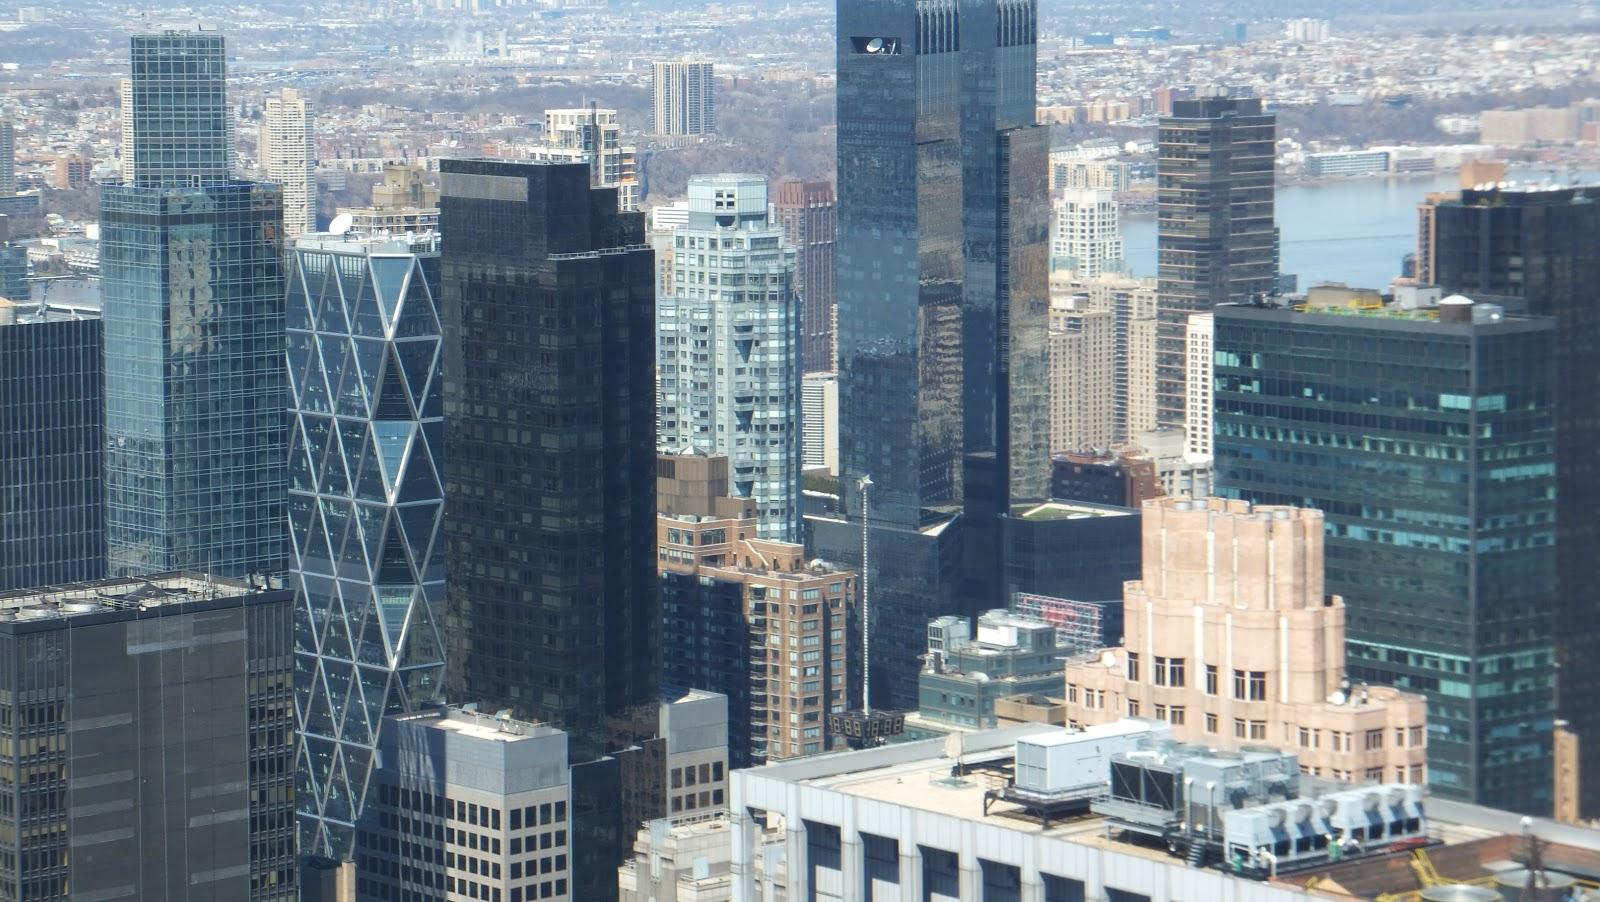 New York, Manhattan vista desde The Top of the Rock, Elisa N, Blog de Viajes, Lifestyle, Travel